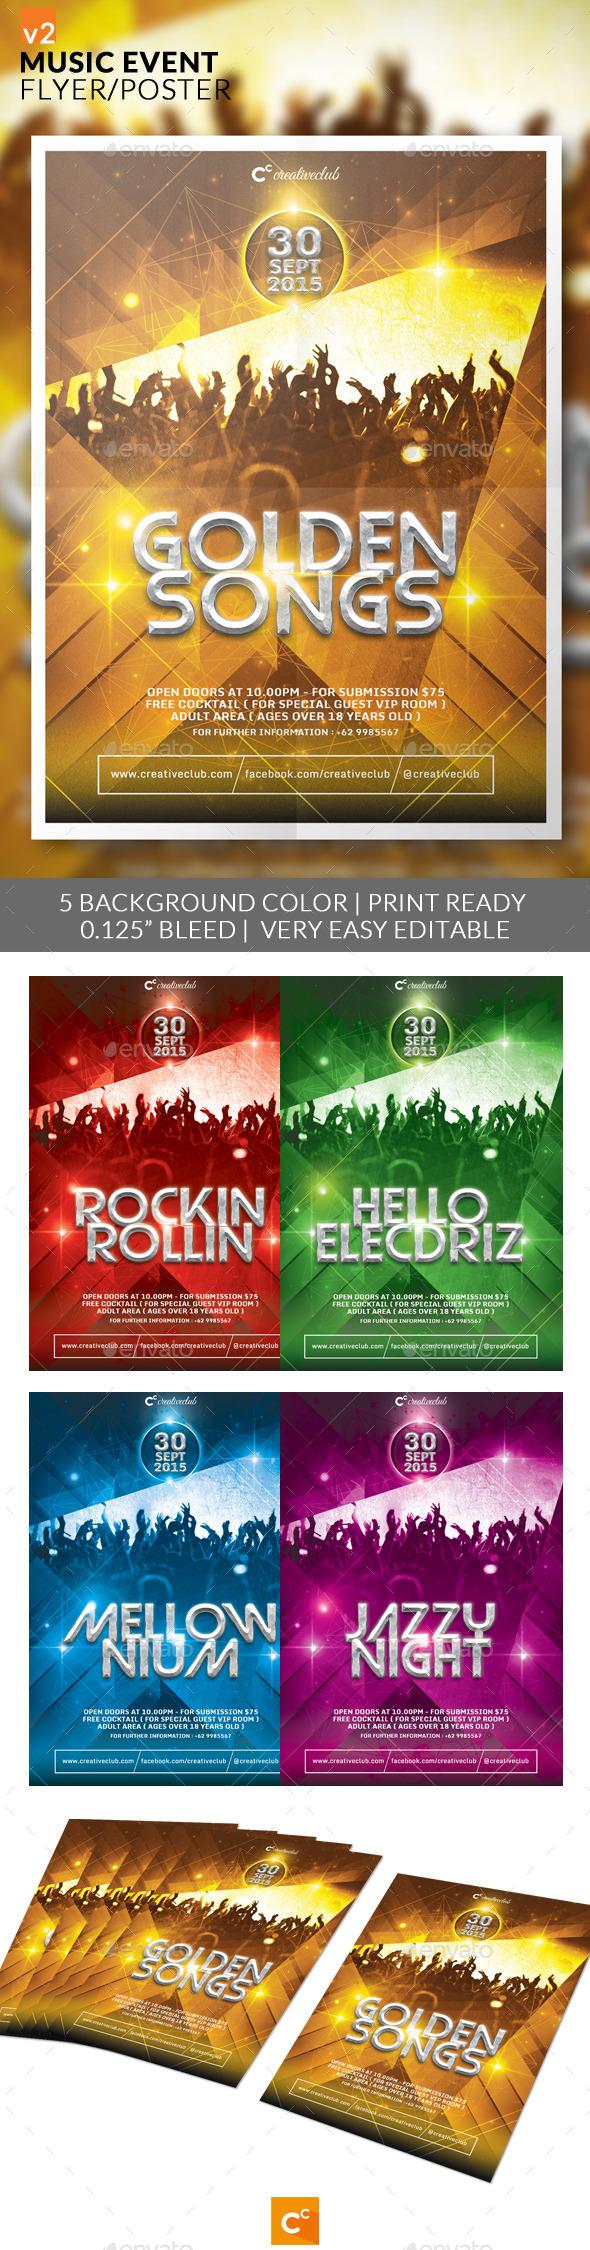 Music Event Flyer/Poster v2 - Concerts Events